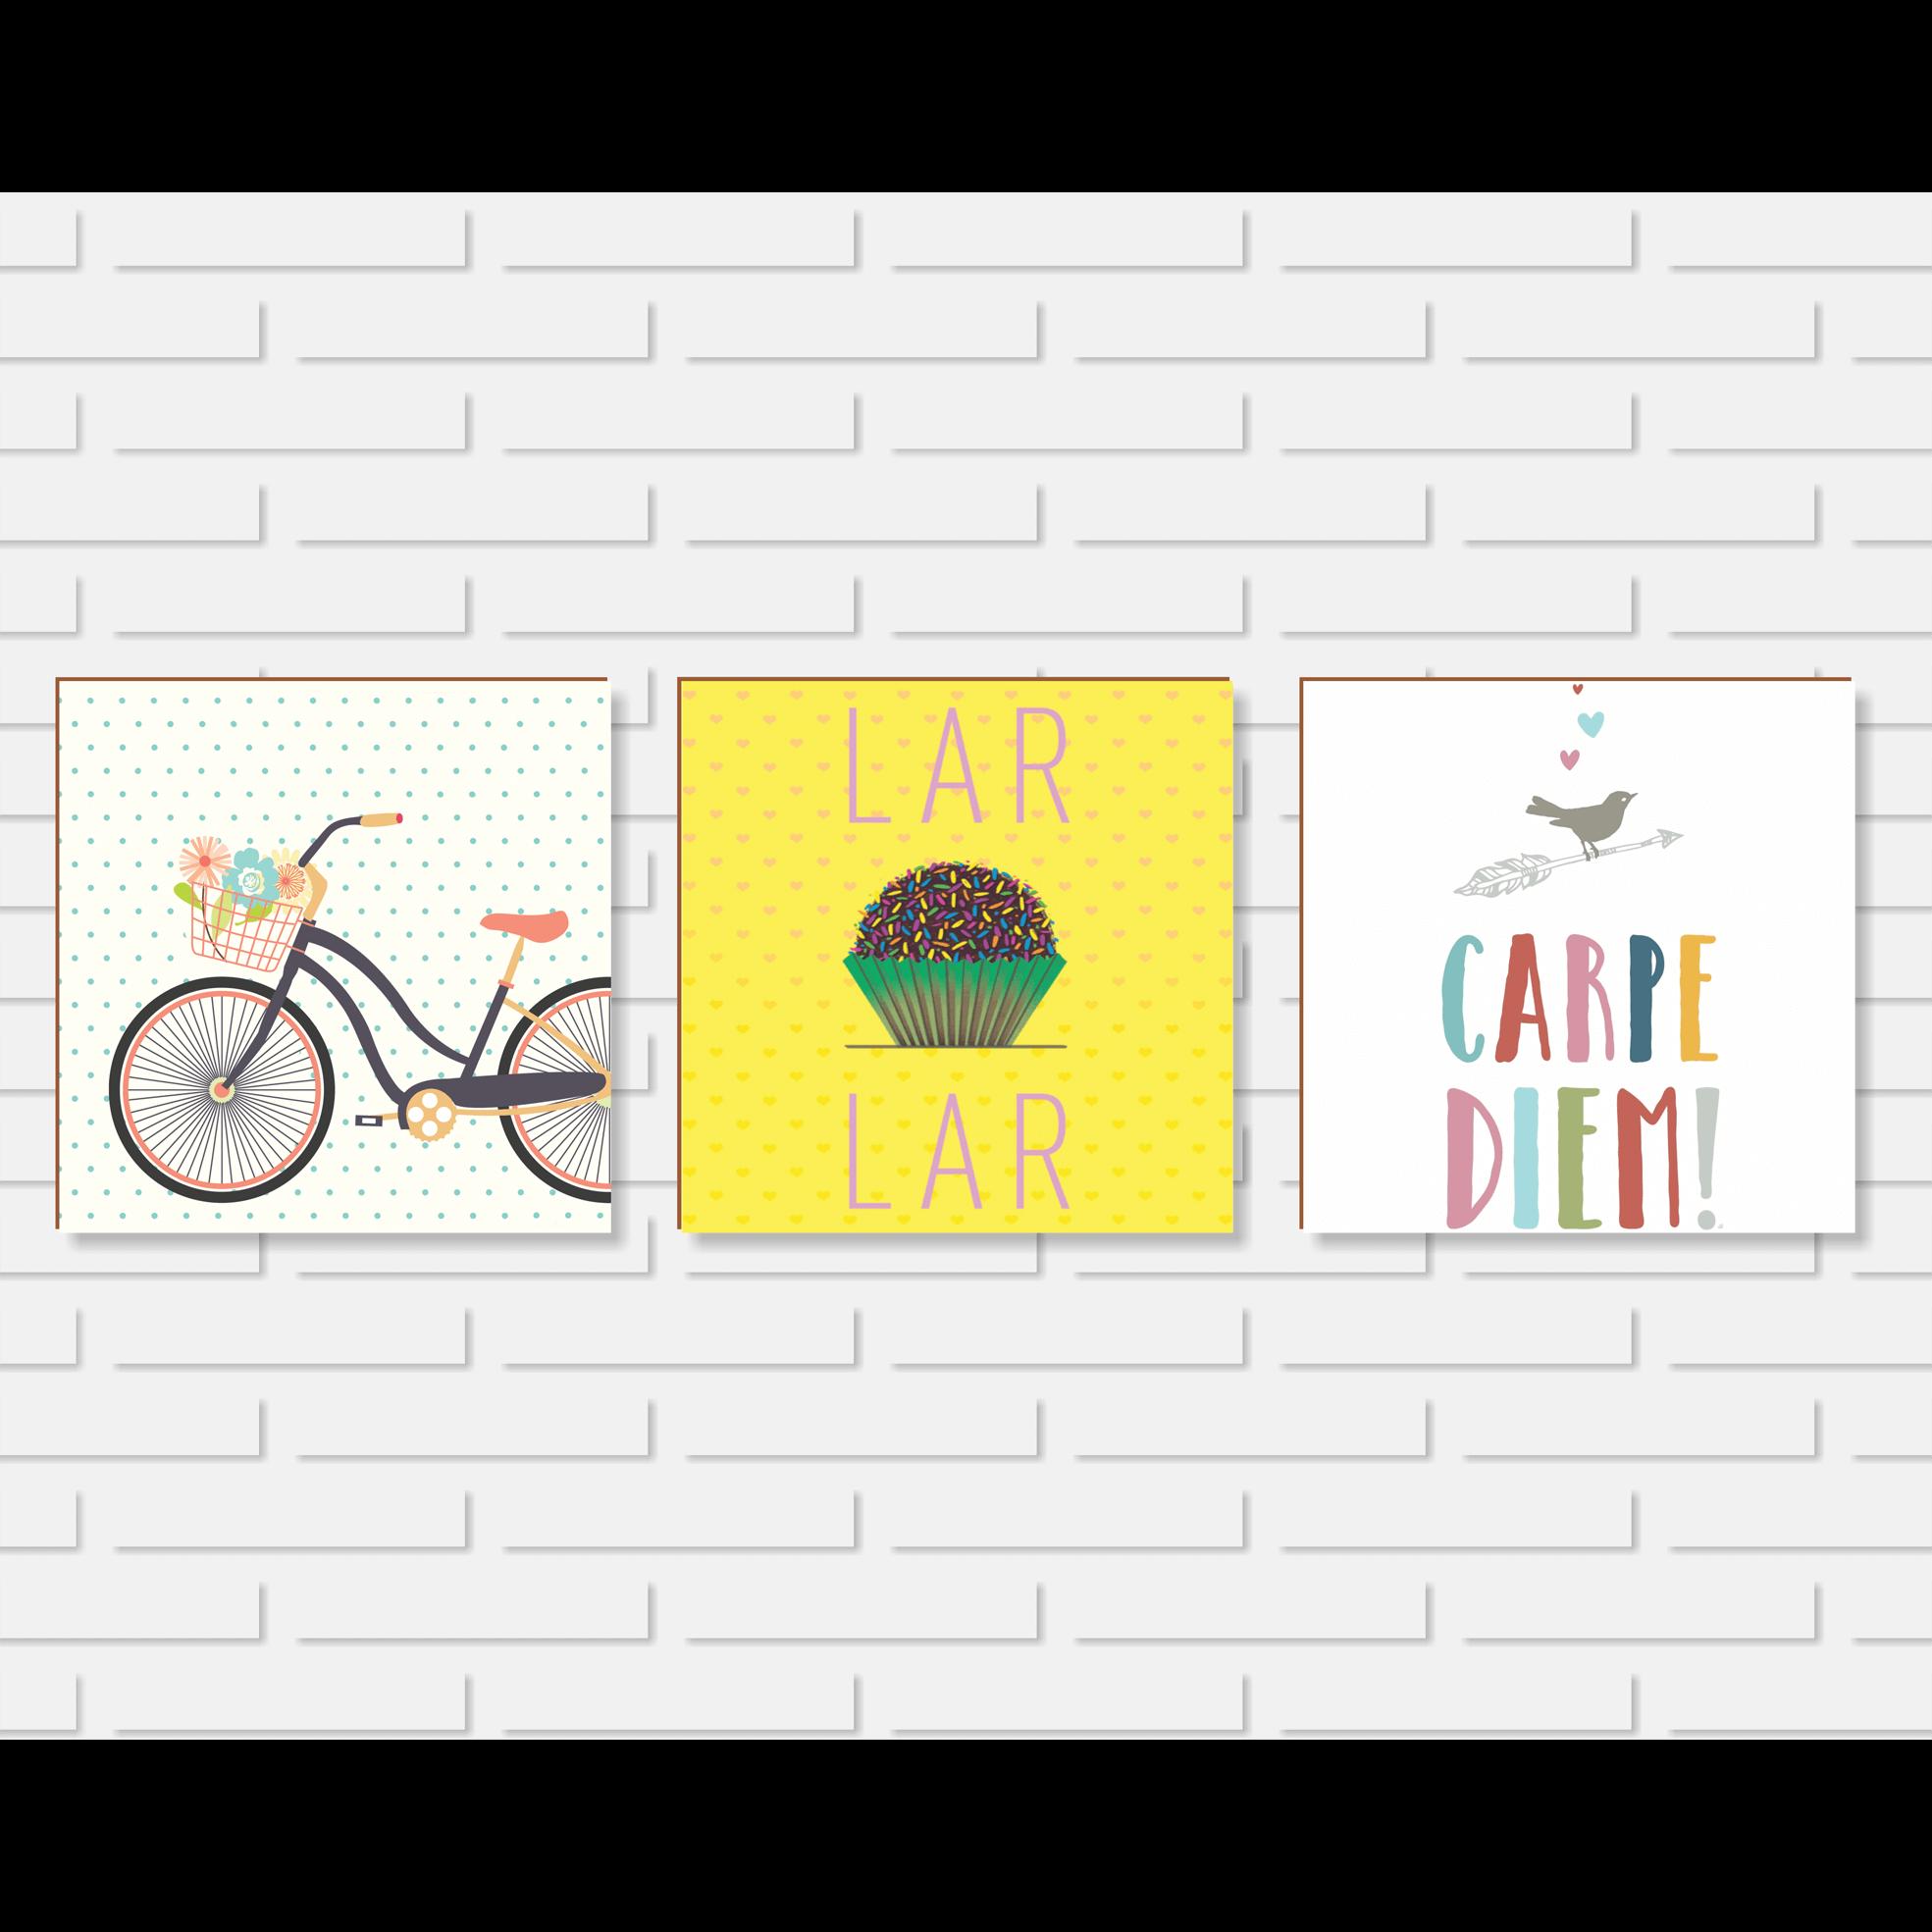 Quadro Decorativo - Kit Bicicleta e Lar Doce Lar e Carpe Diem - 20x20 ou 30x30cm